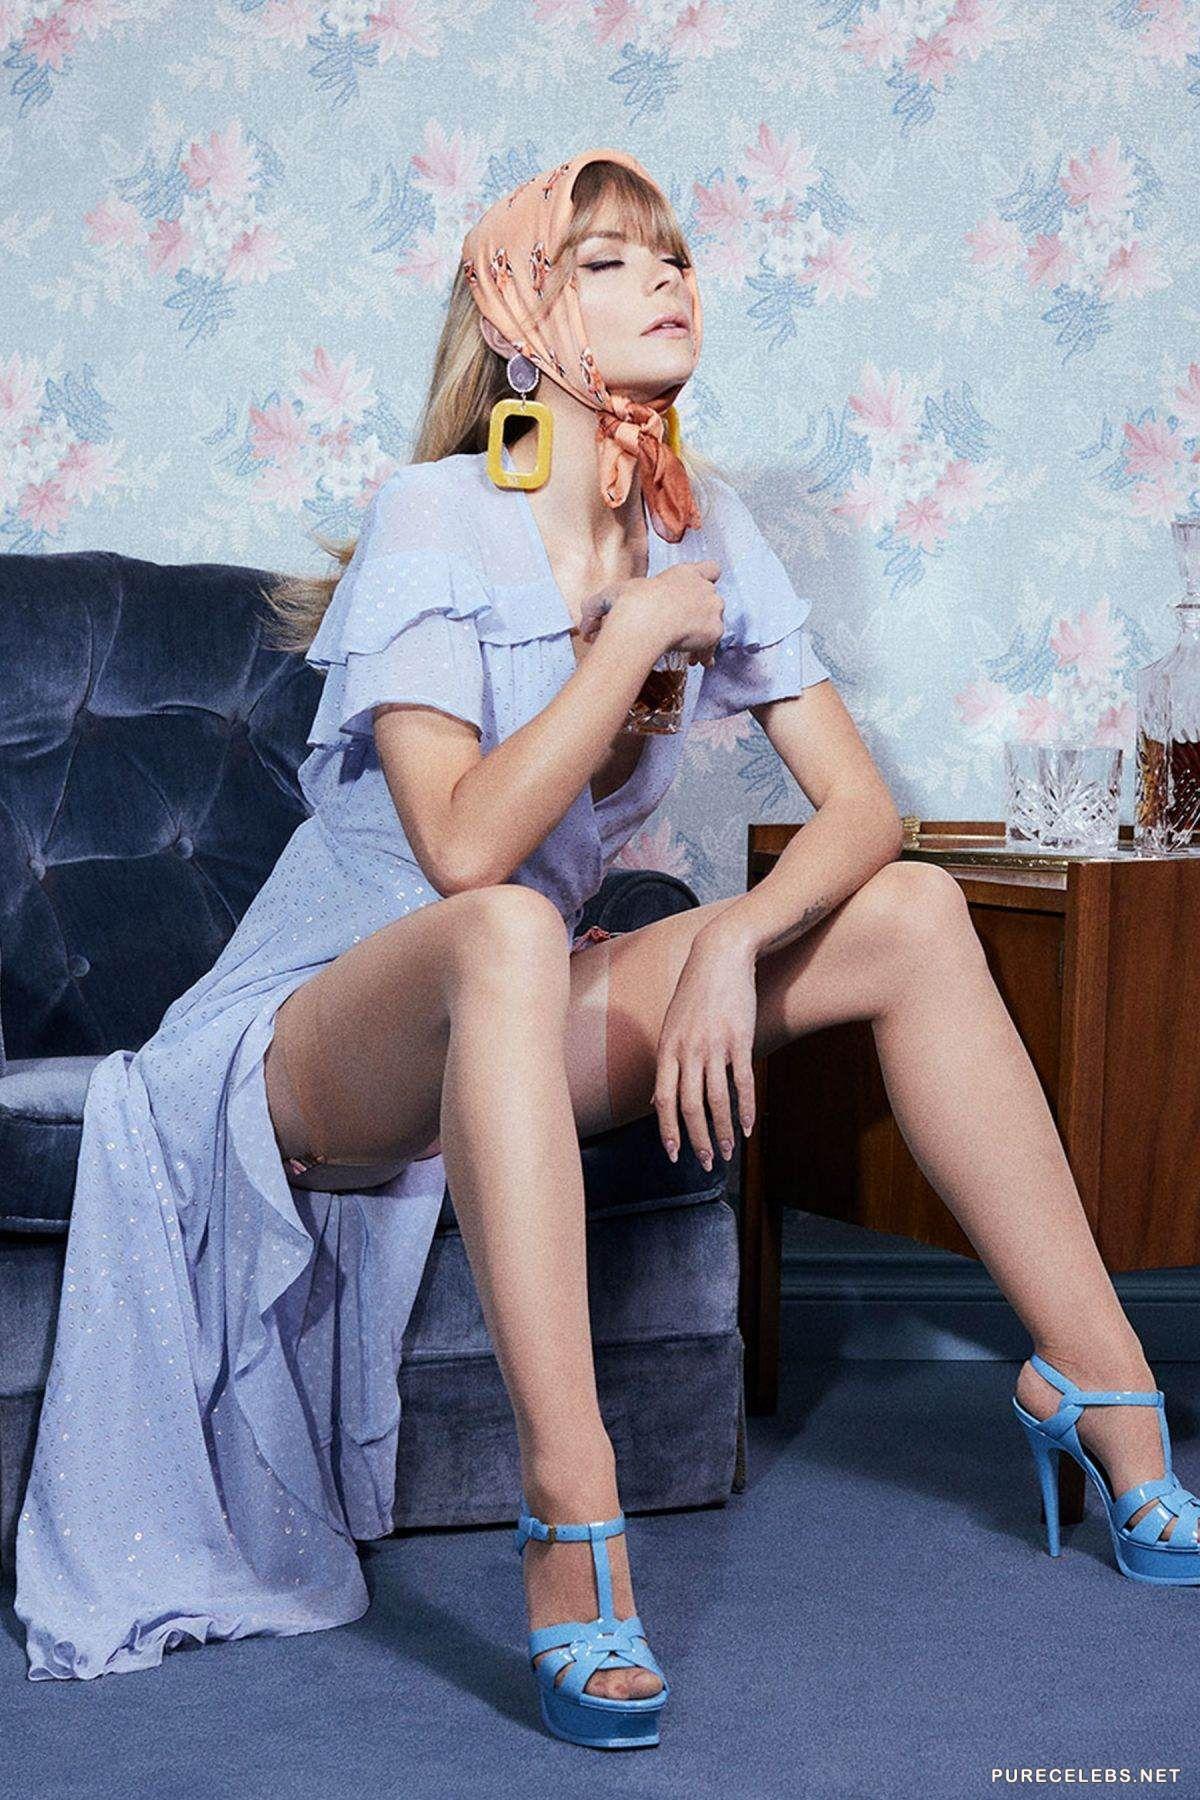 Jaime King Posing Sexy In Lingerie For Los Angeles Fashion Brand - For Love & Lemons - NuCelebs.com